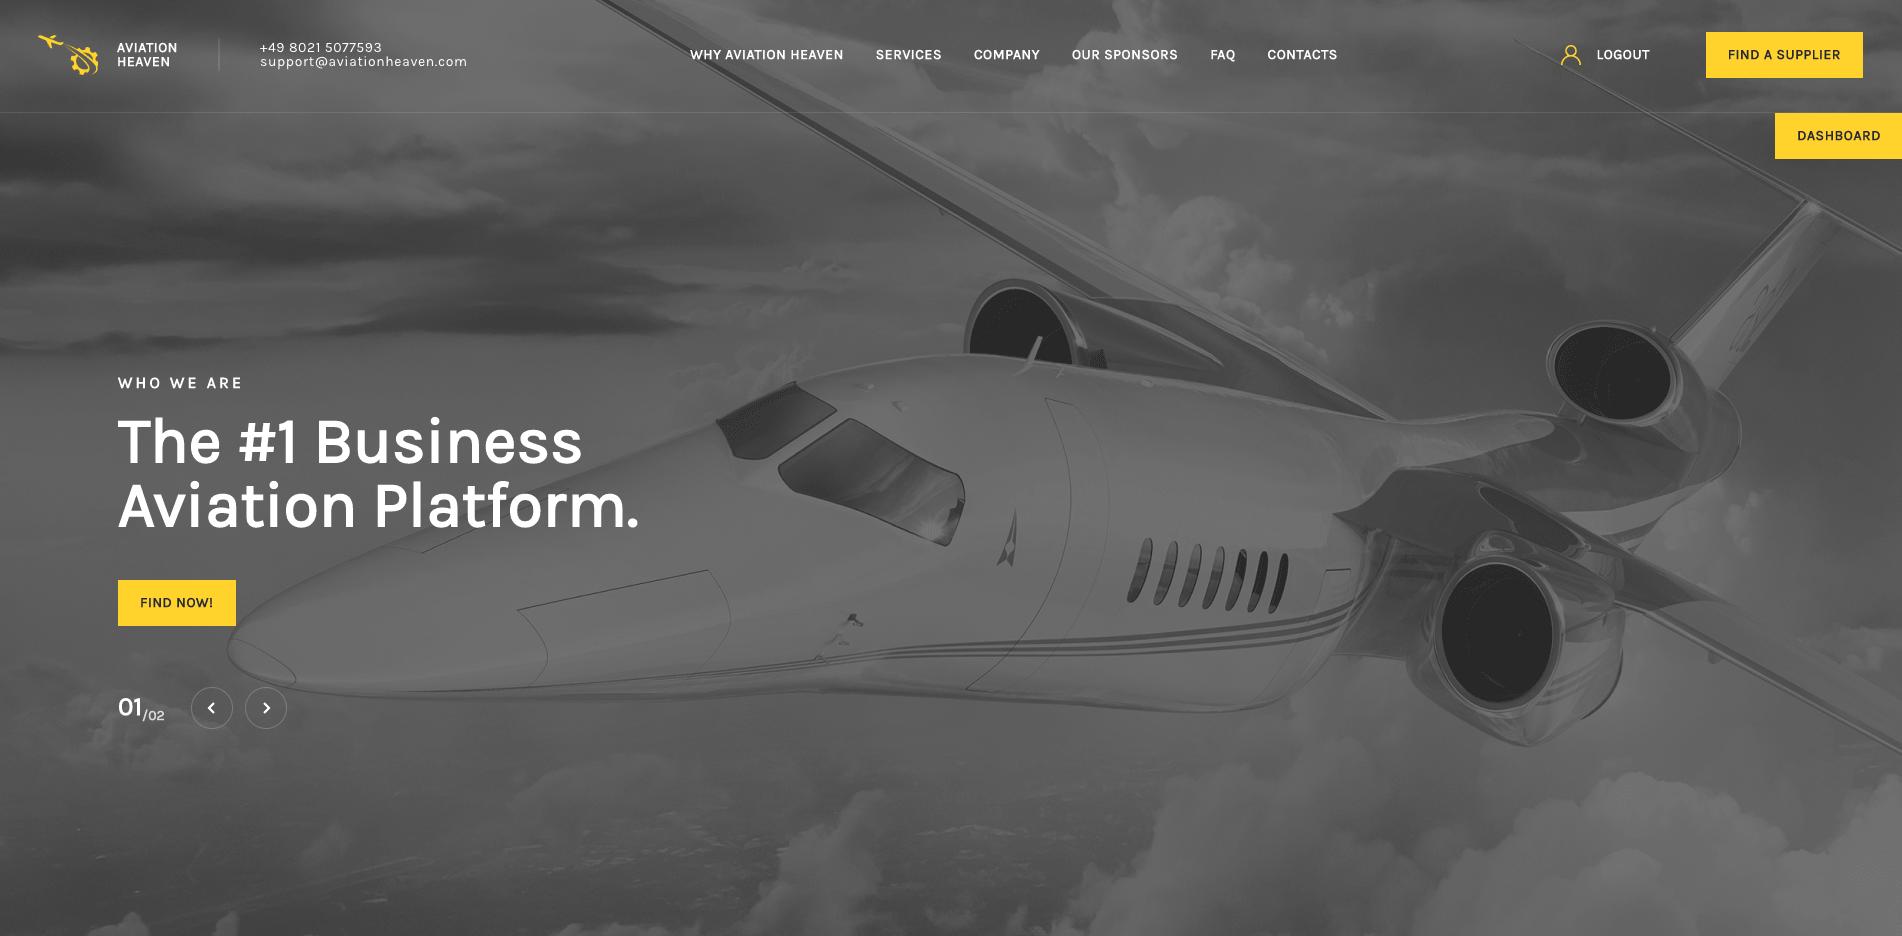 aviation-service-marketplace5e694ad4d643b34419fb406e